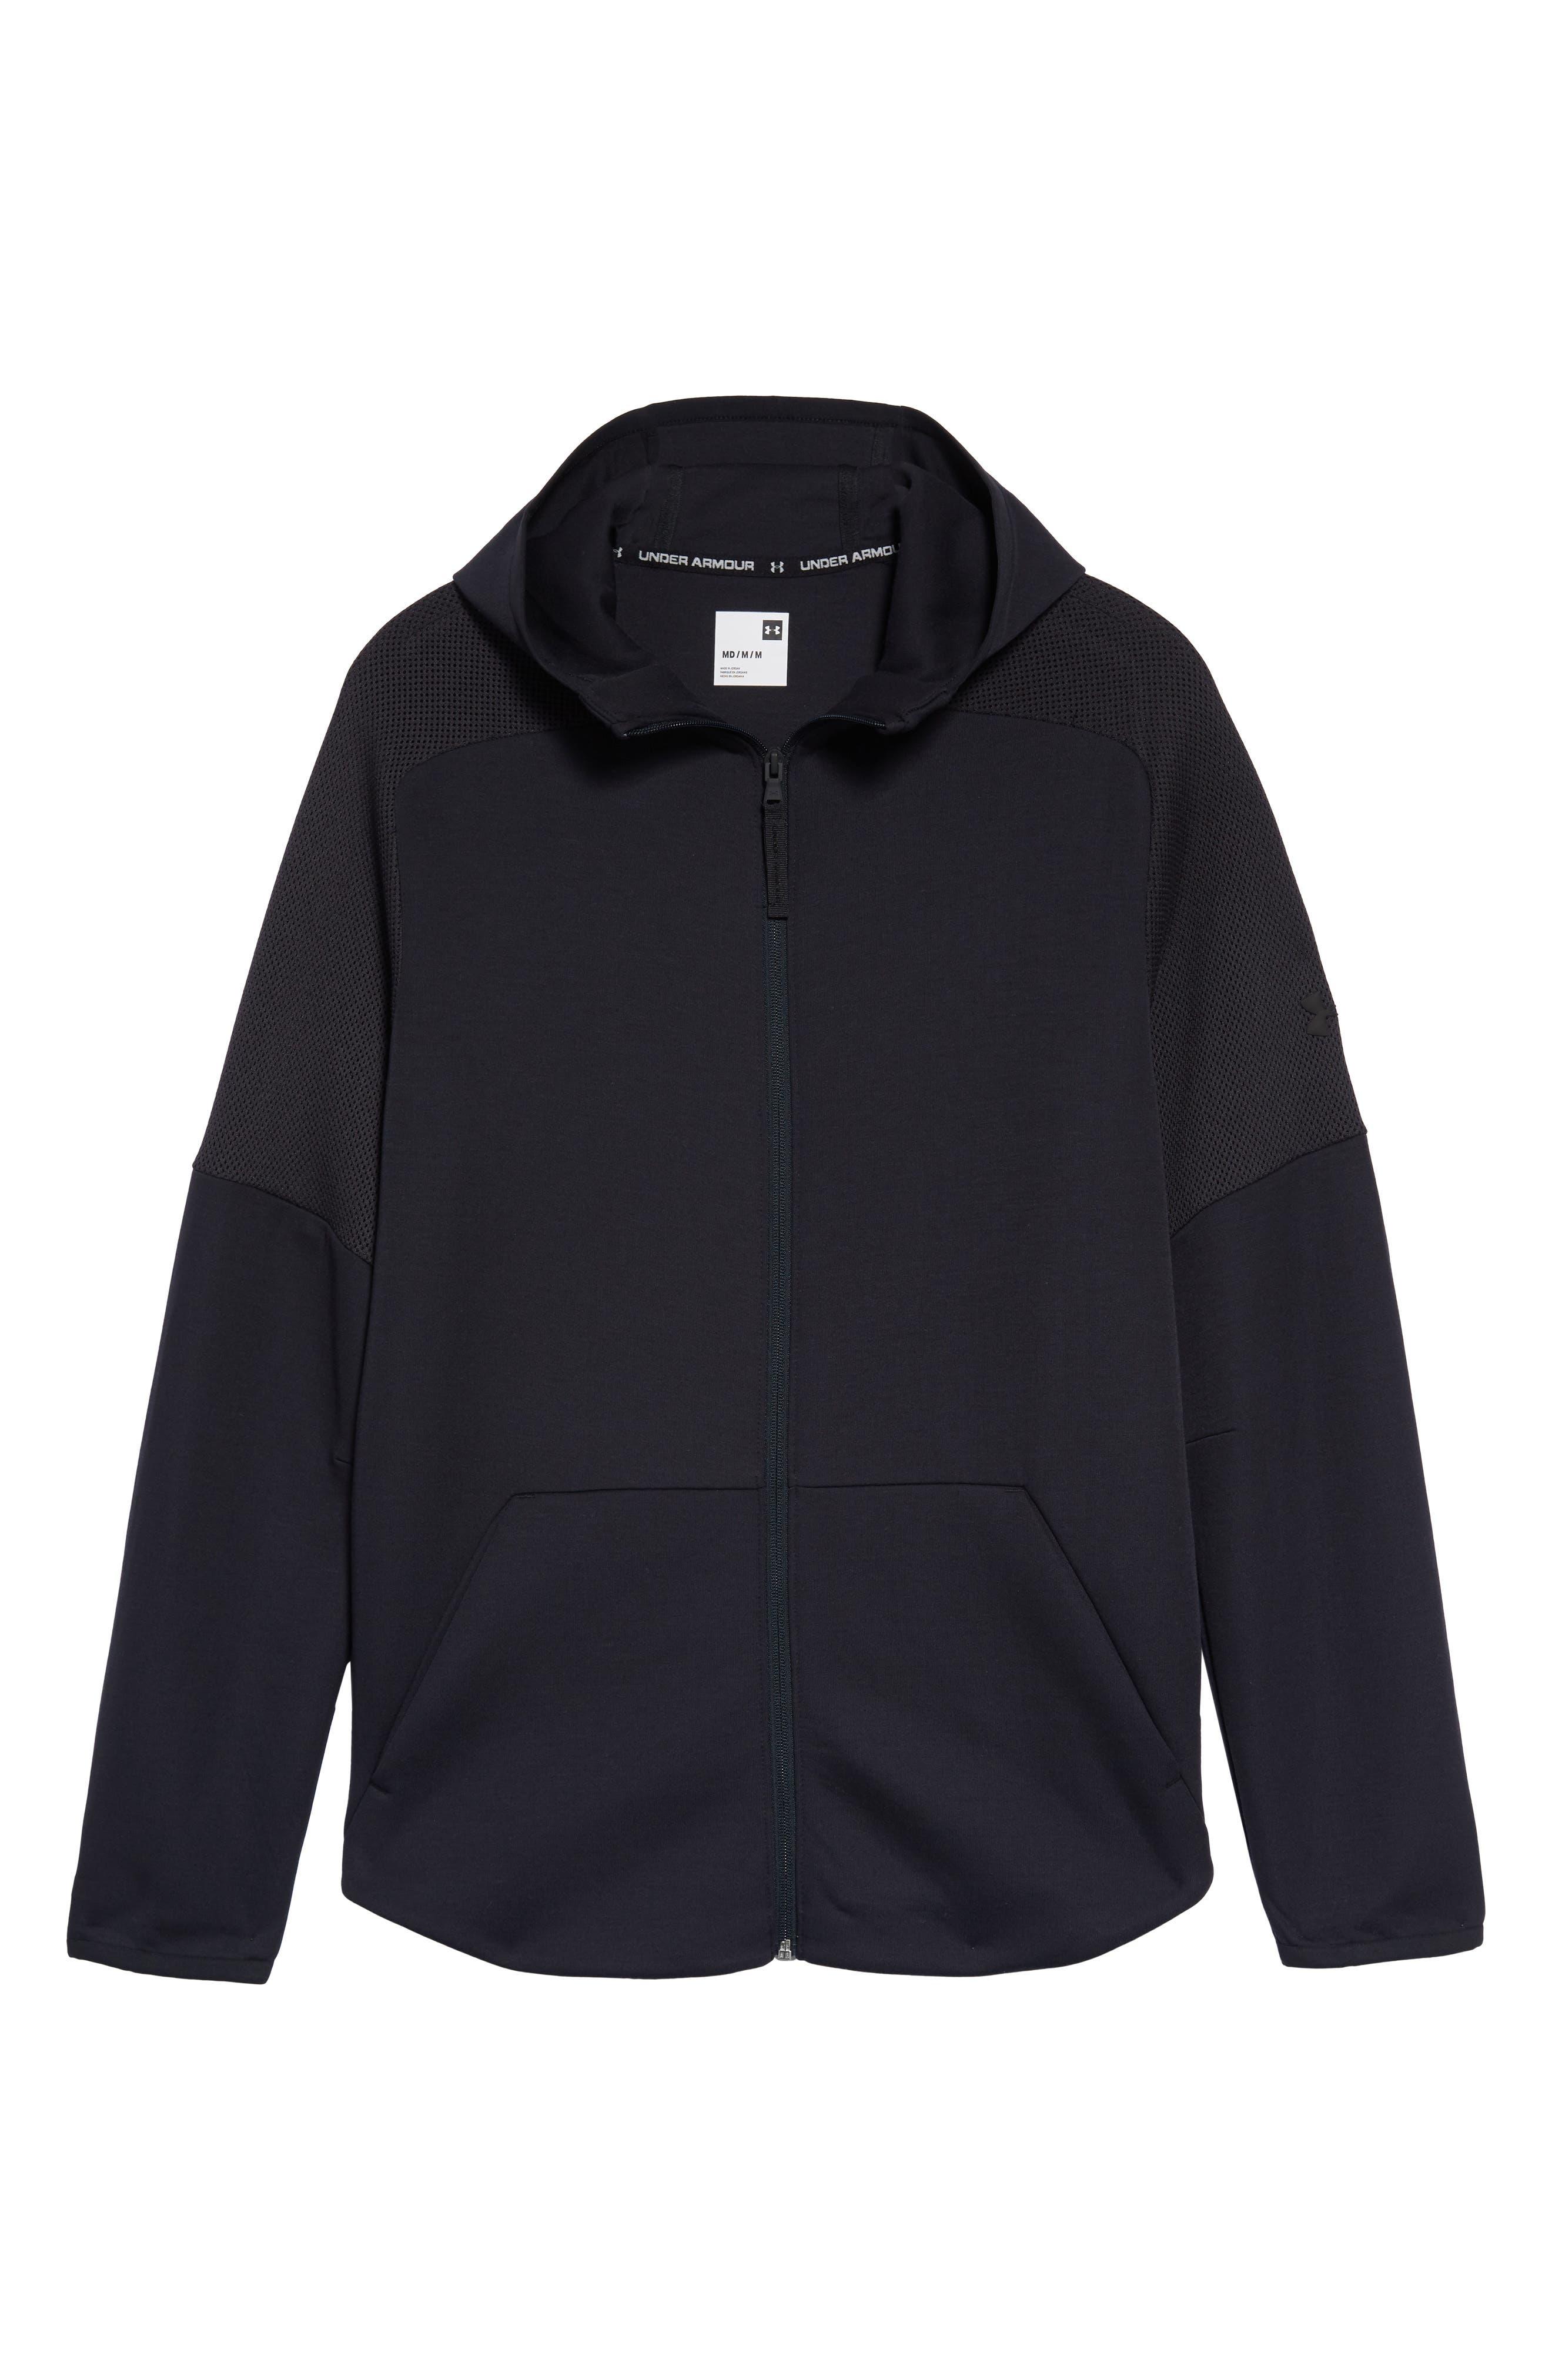 ,                             Unstoppable Move Light Full-Zip Hooded Sweatshirt,                             Alternate thumbnail 11, color,                             003